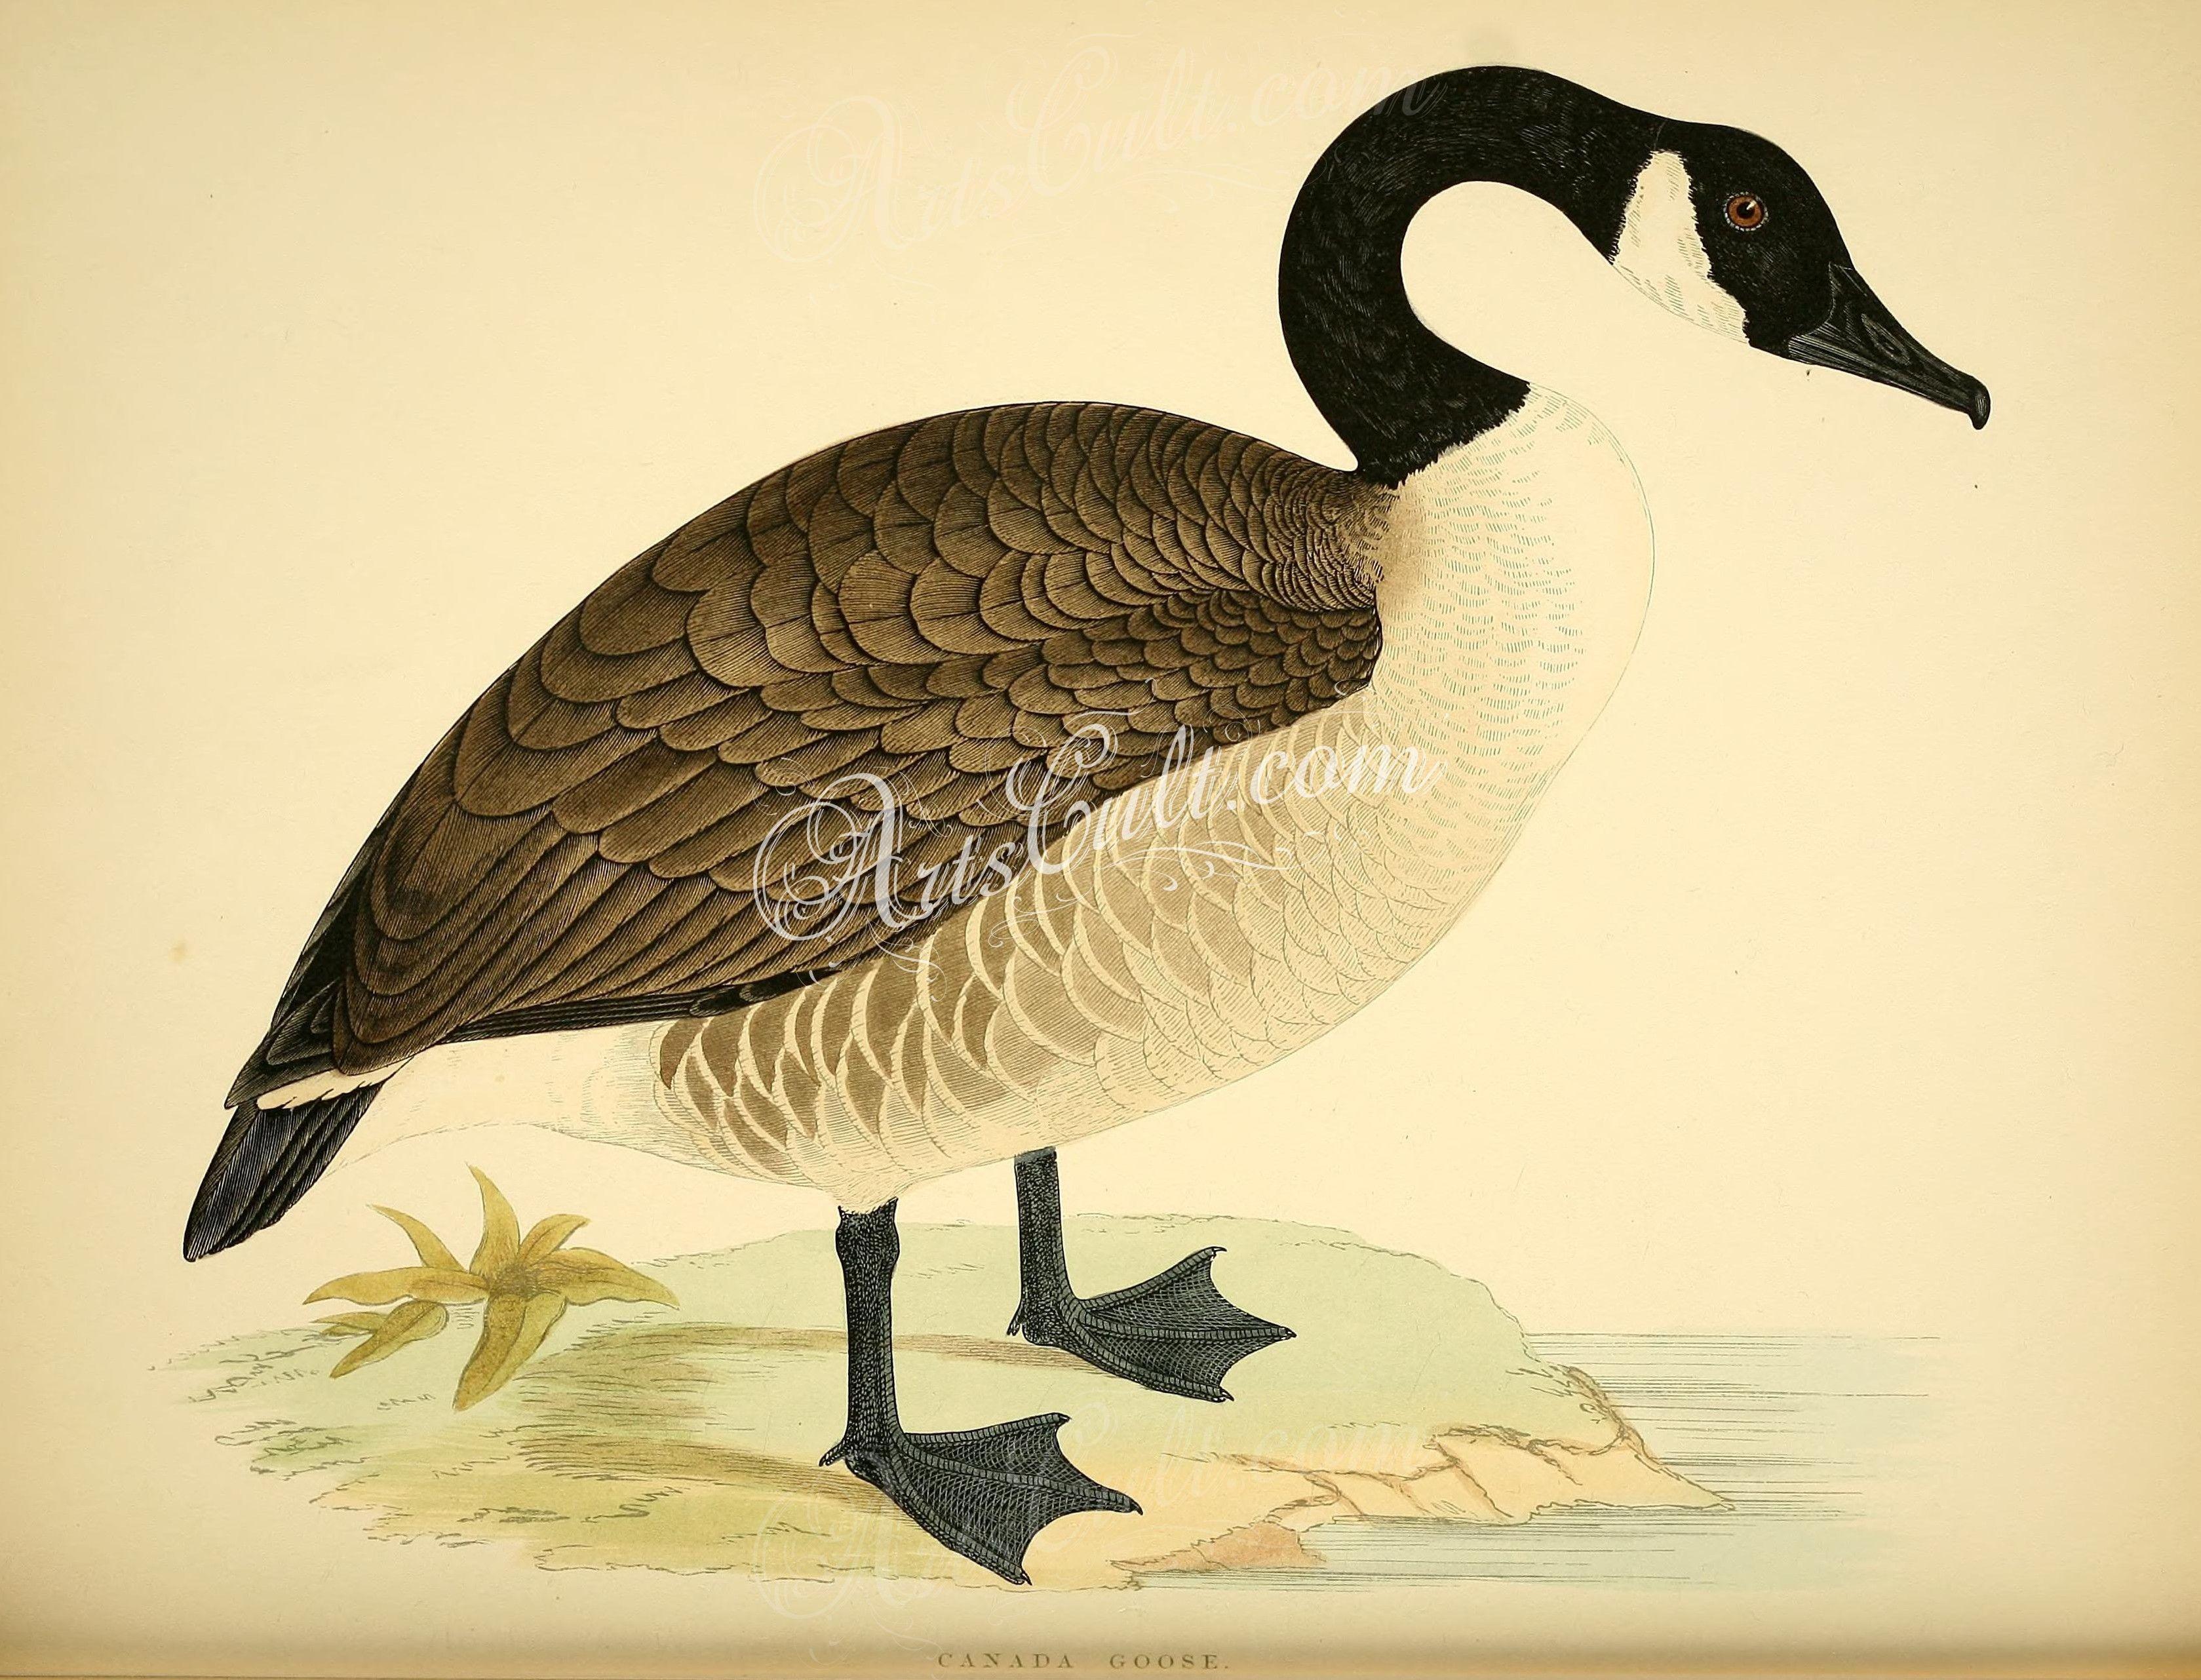 Canada Goose ... | ArtsCult.com | Pinterest | Canada goose, String ...